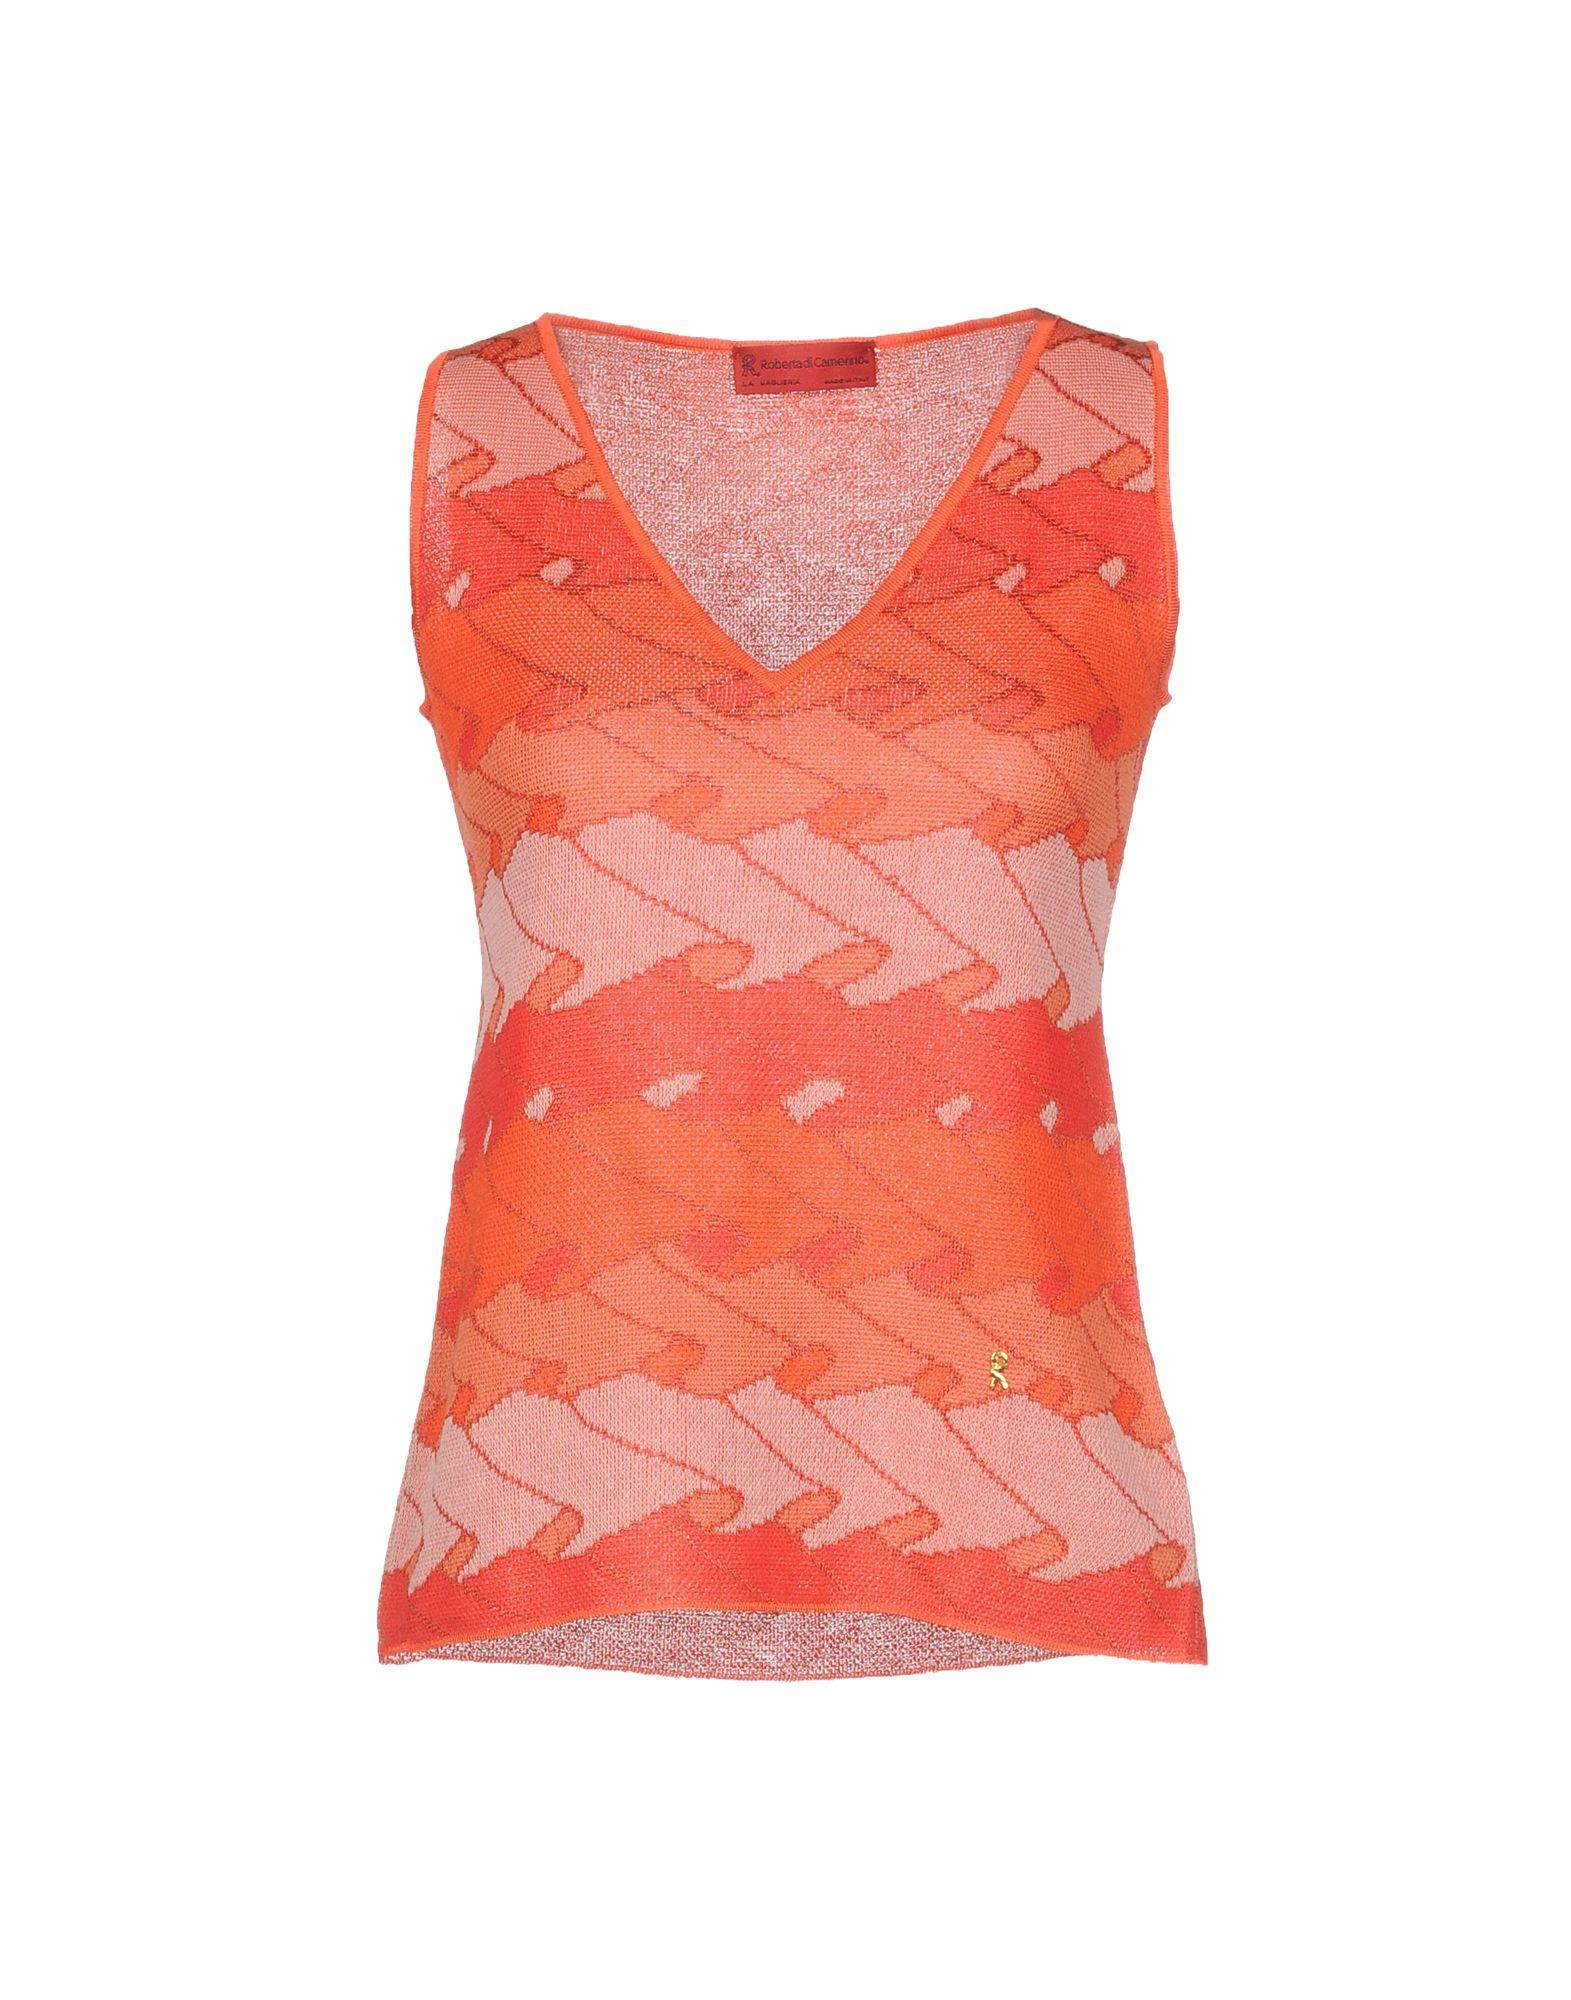 ROBERTA DI CAMERINO Sweater in Orange